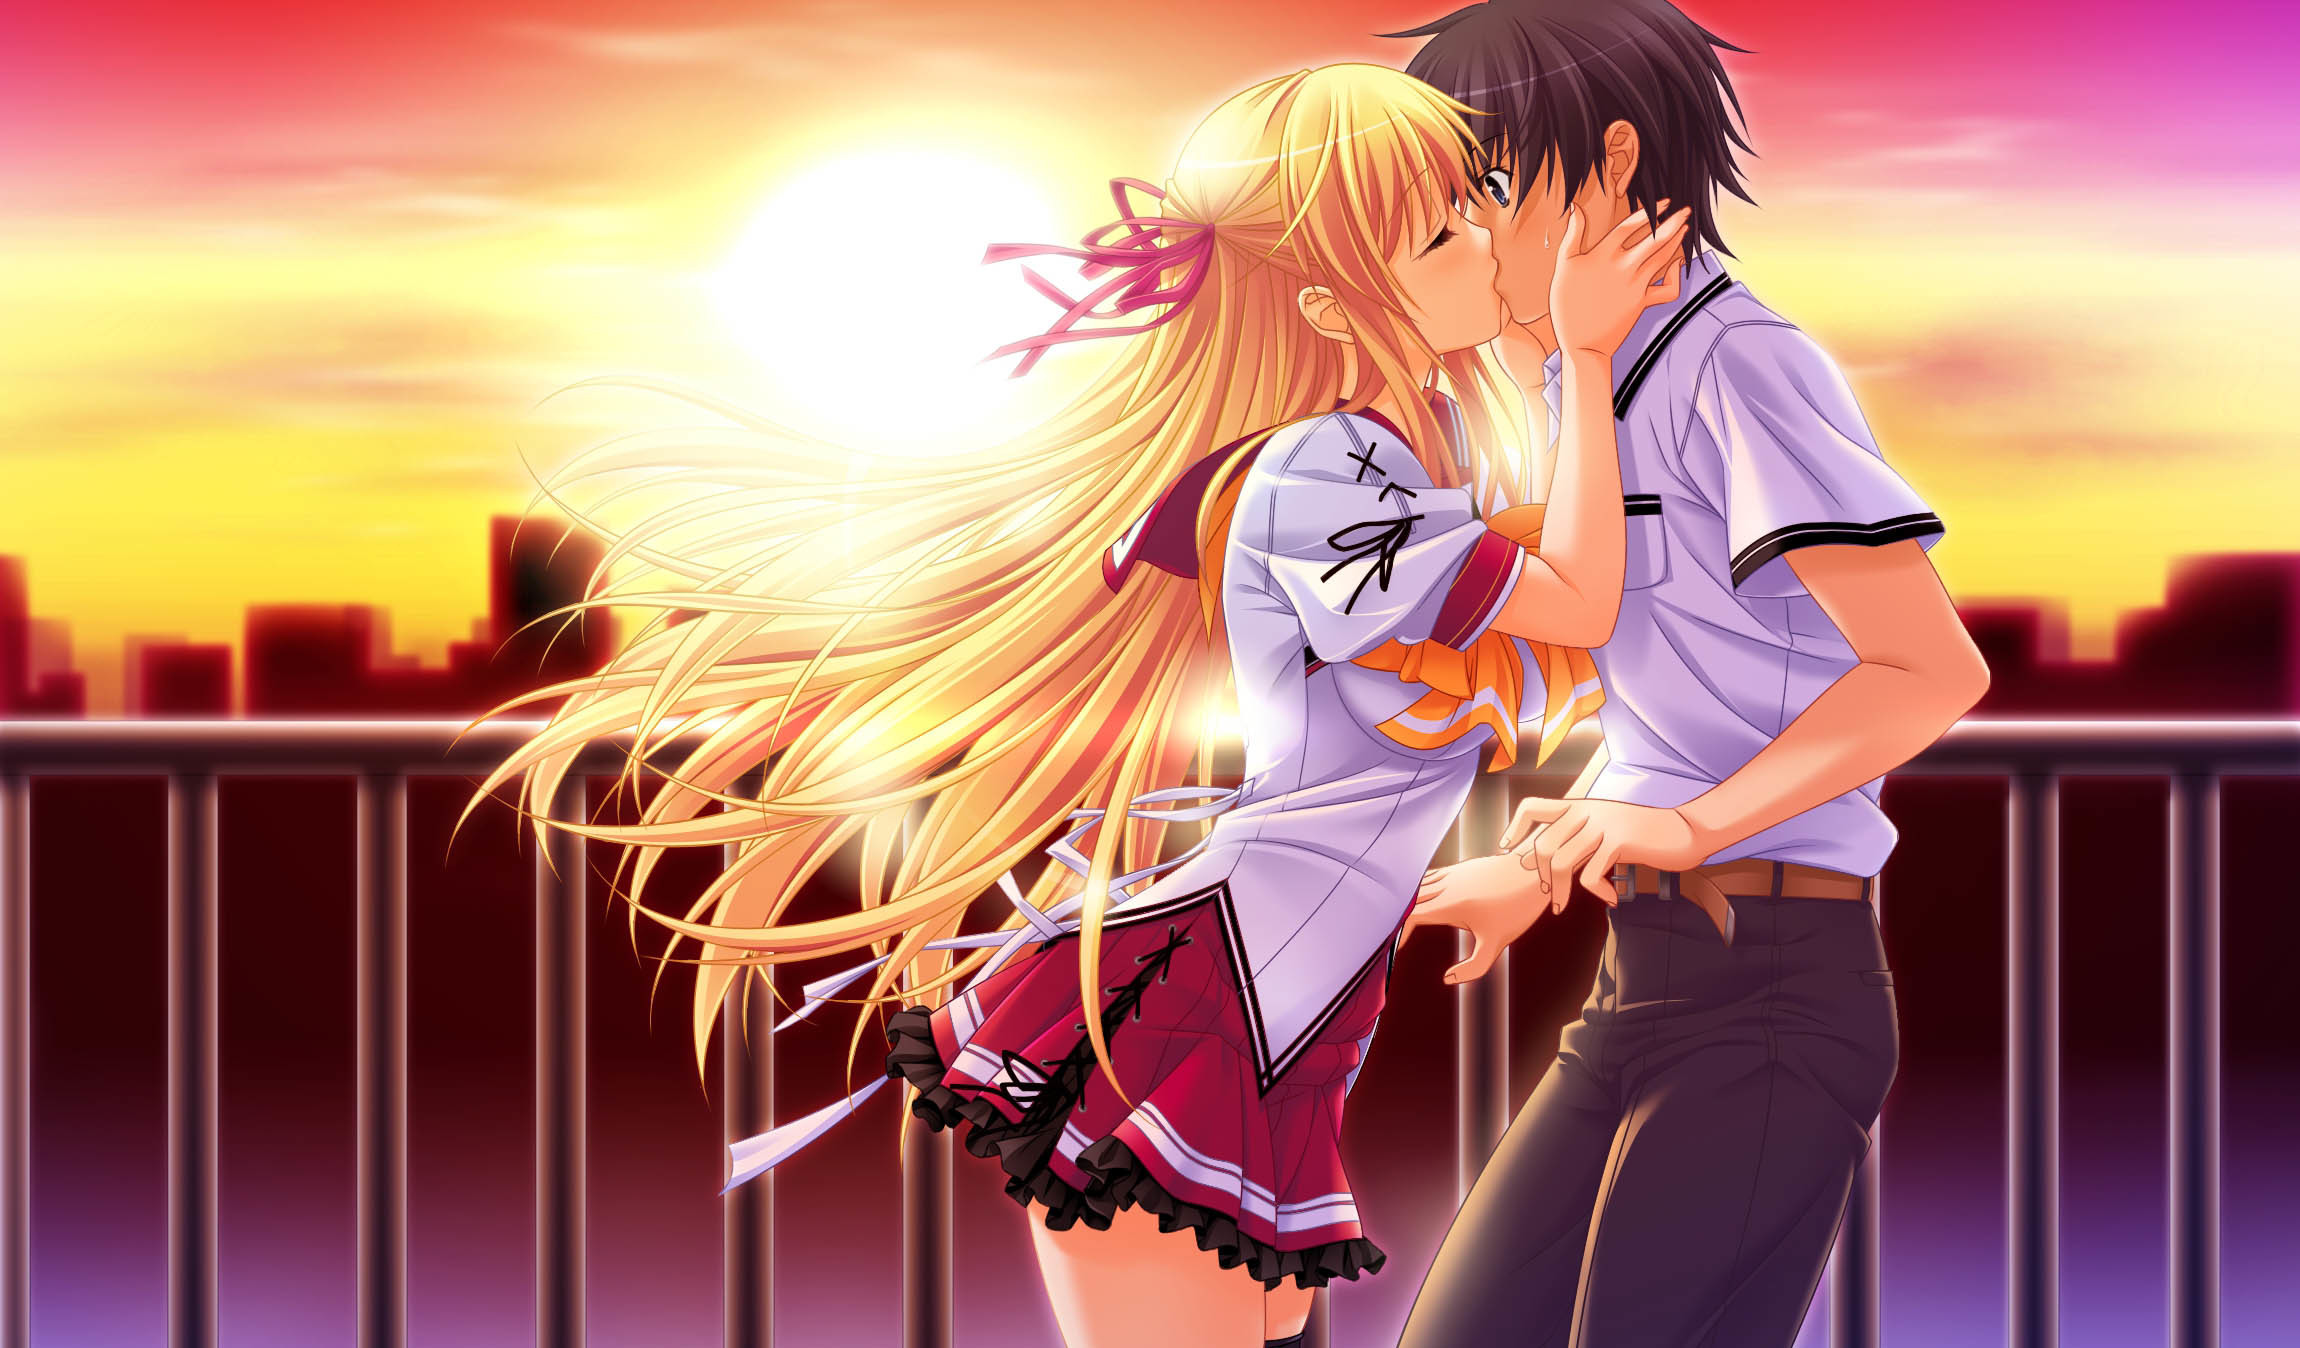 Romantic Anime Wallpaper